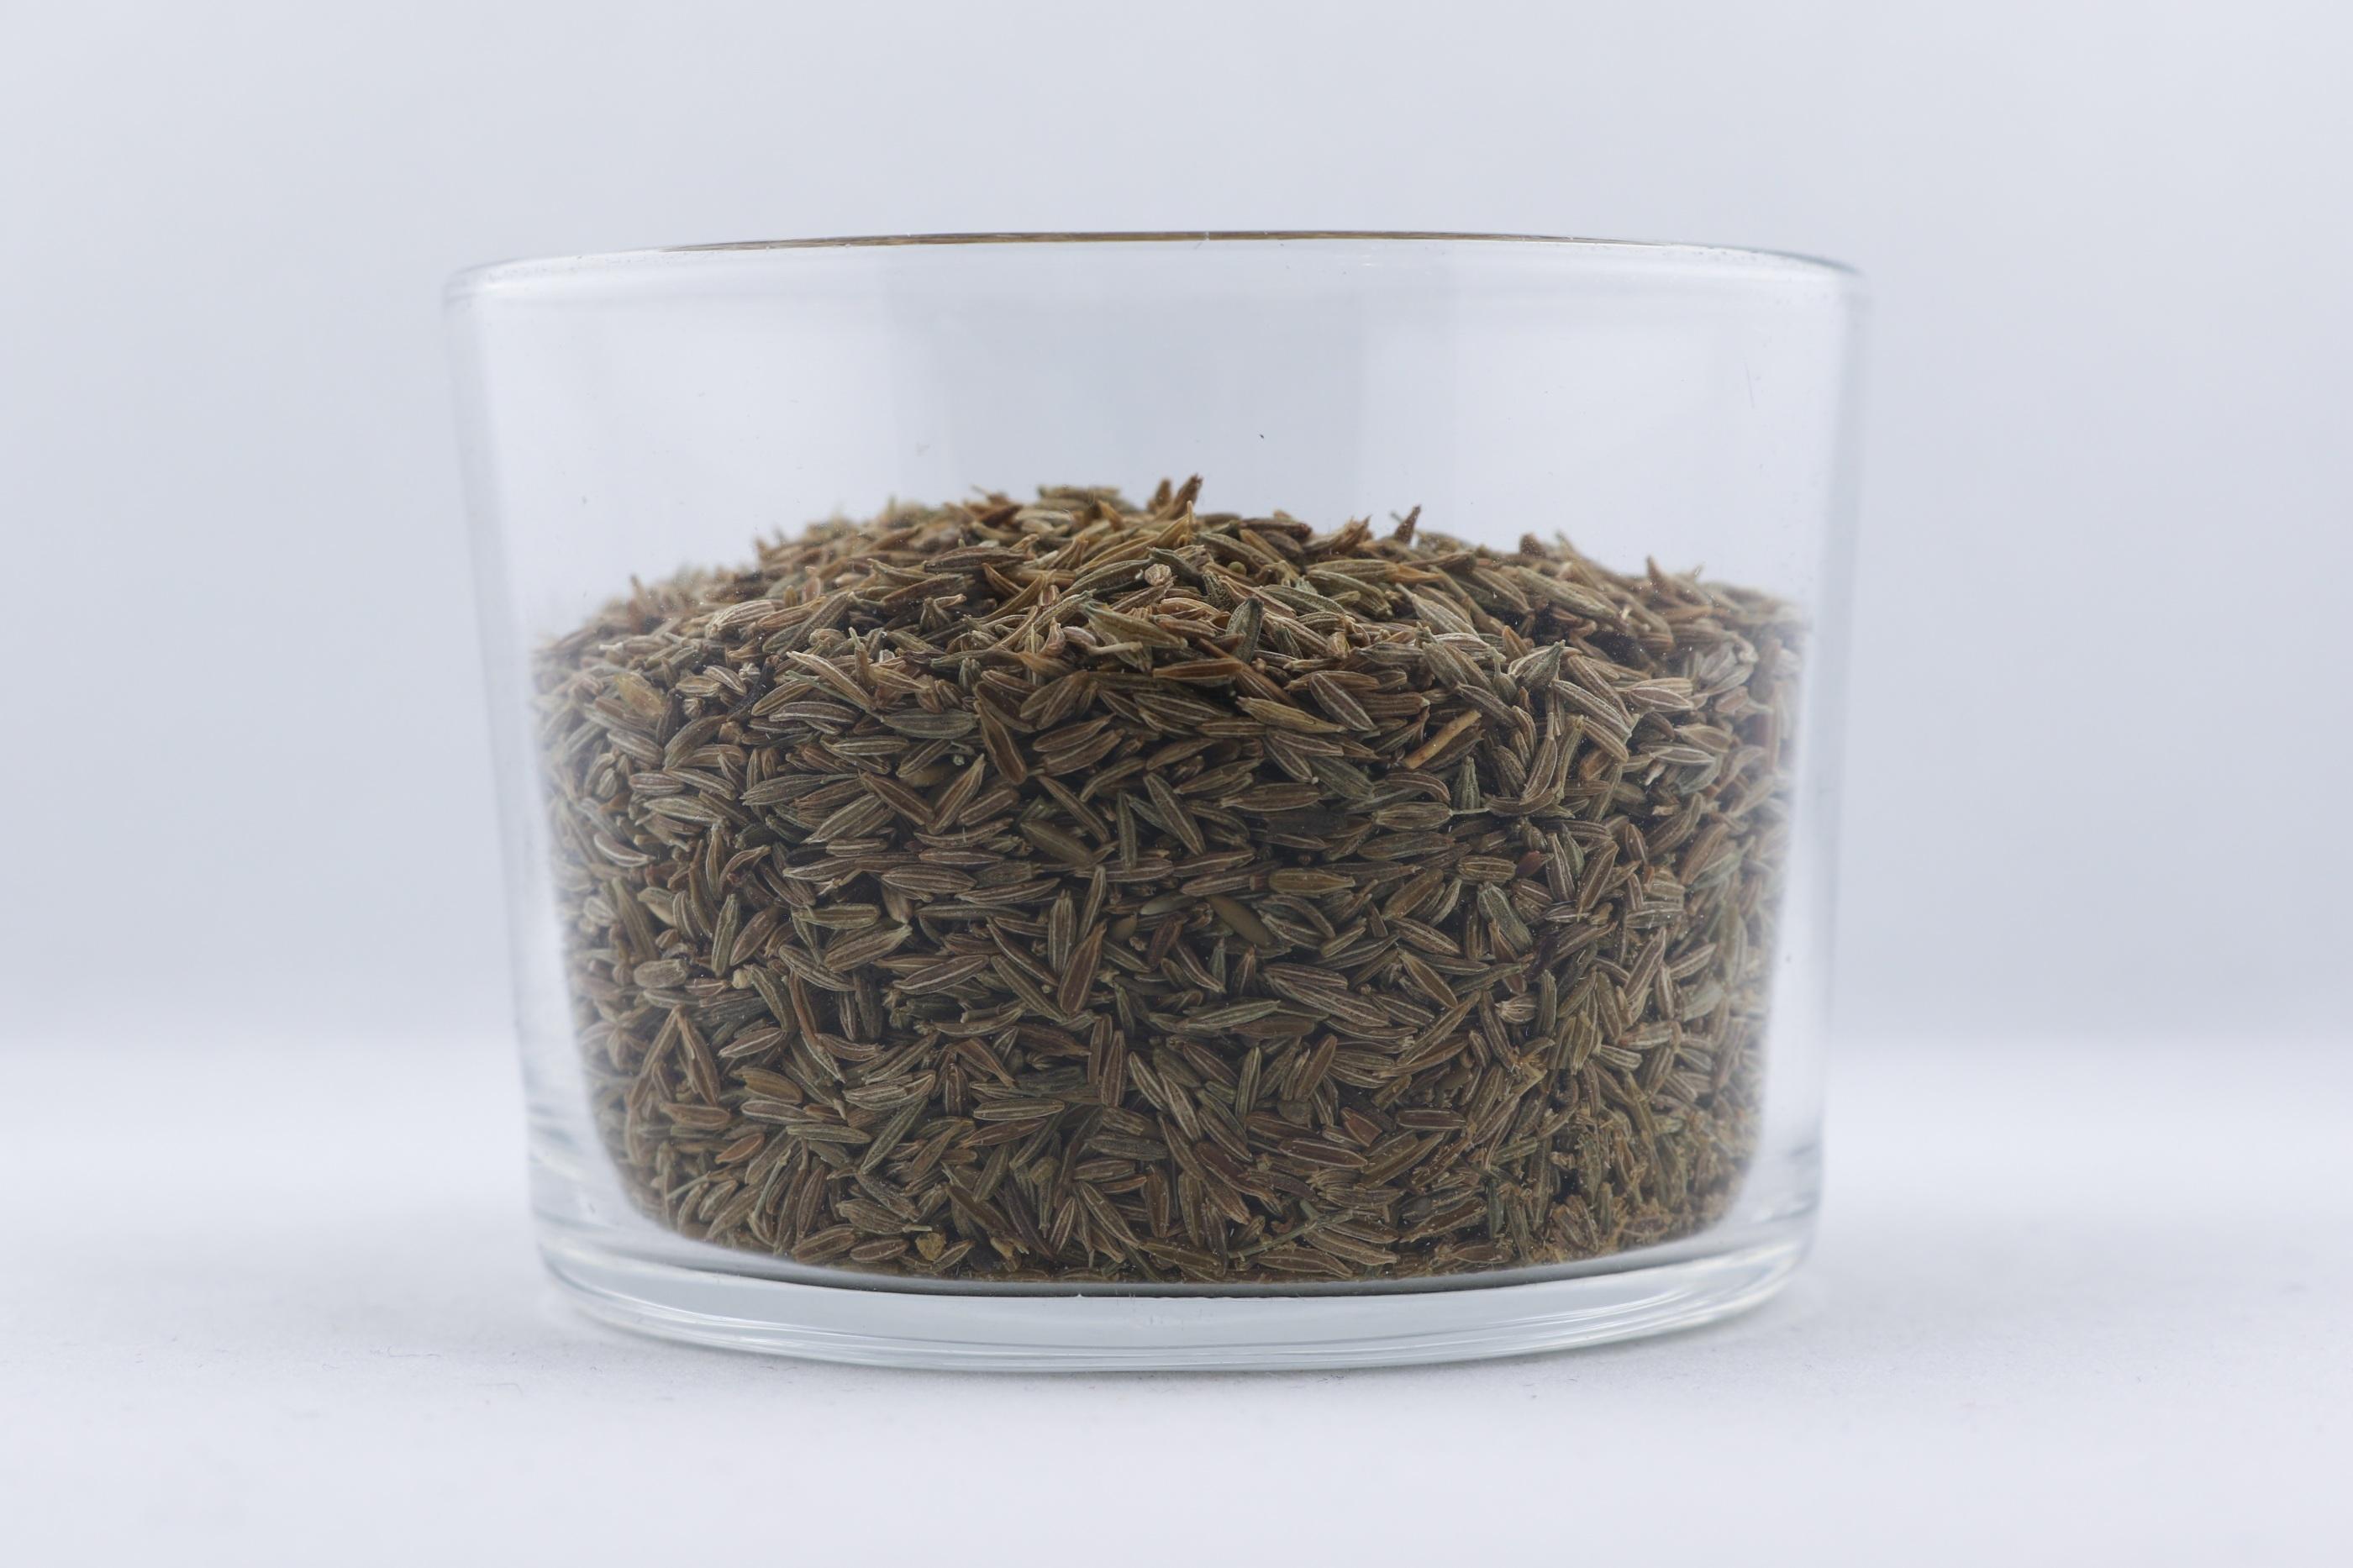 Spiskummin wellness ayurveda halmstad sweden svensk krydda lösvikt eko ekologisk